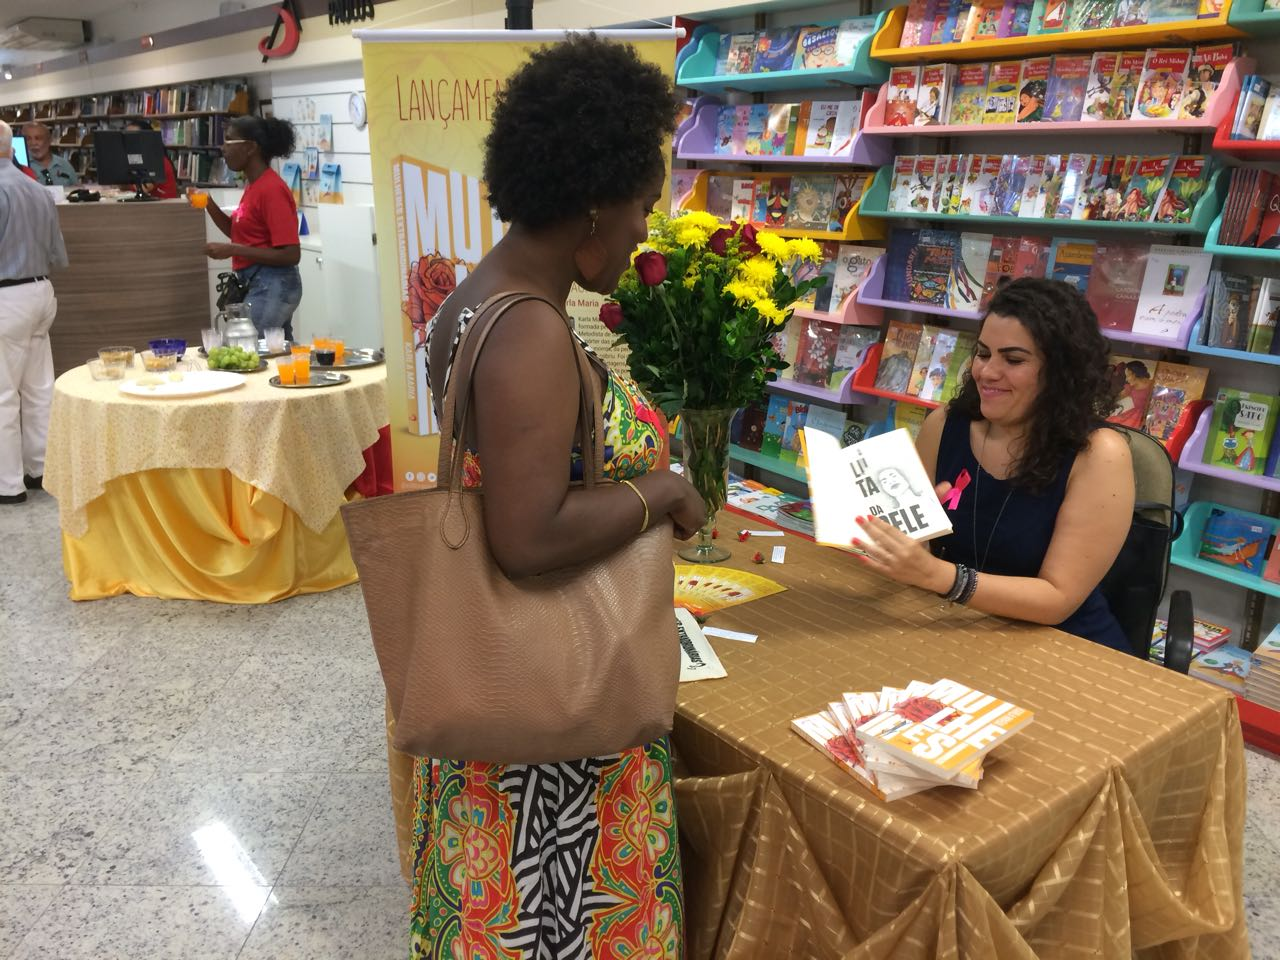 1c604c6bc54 PAULUS Livraria promove lançamentos na capital baiana